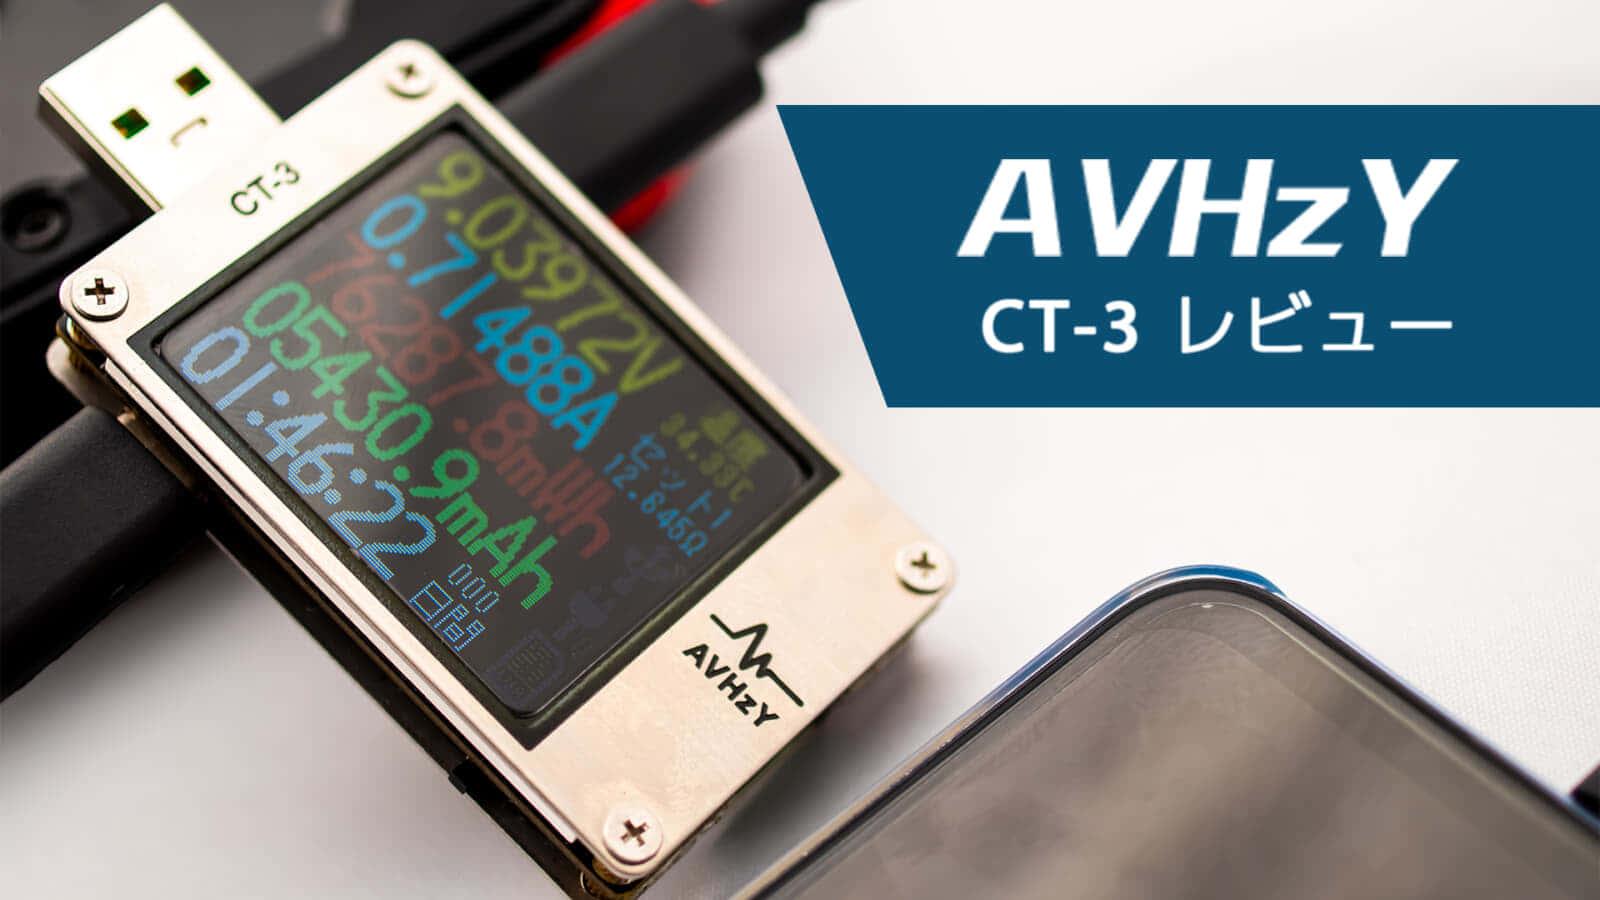 AVHzY CT-3 レビュー、USB充電器やモバイルバッテリーの測定デバイス